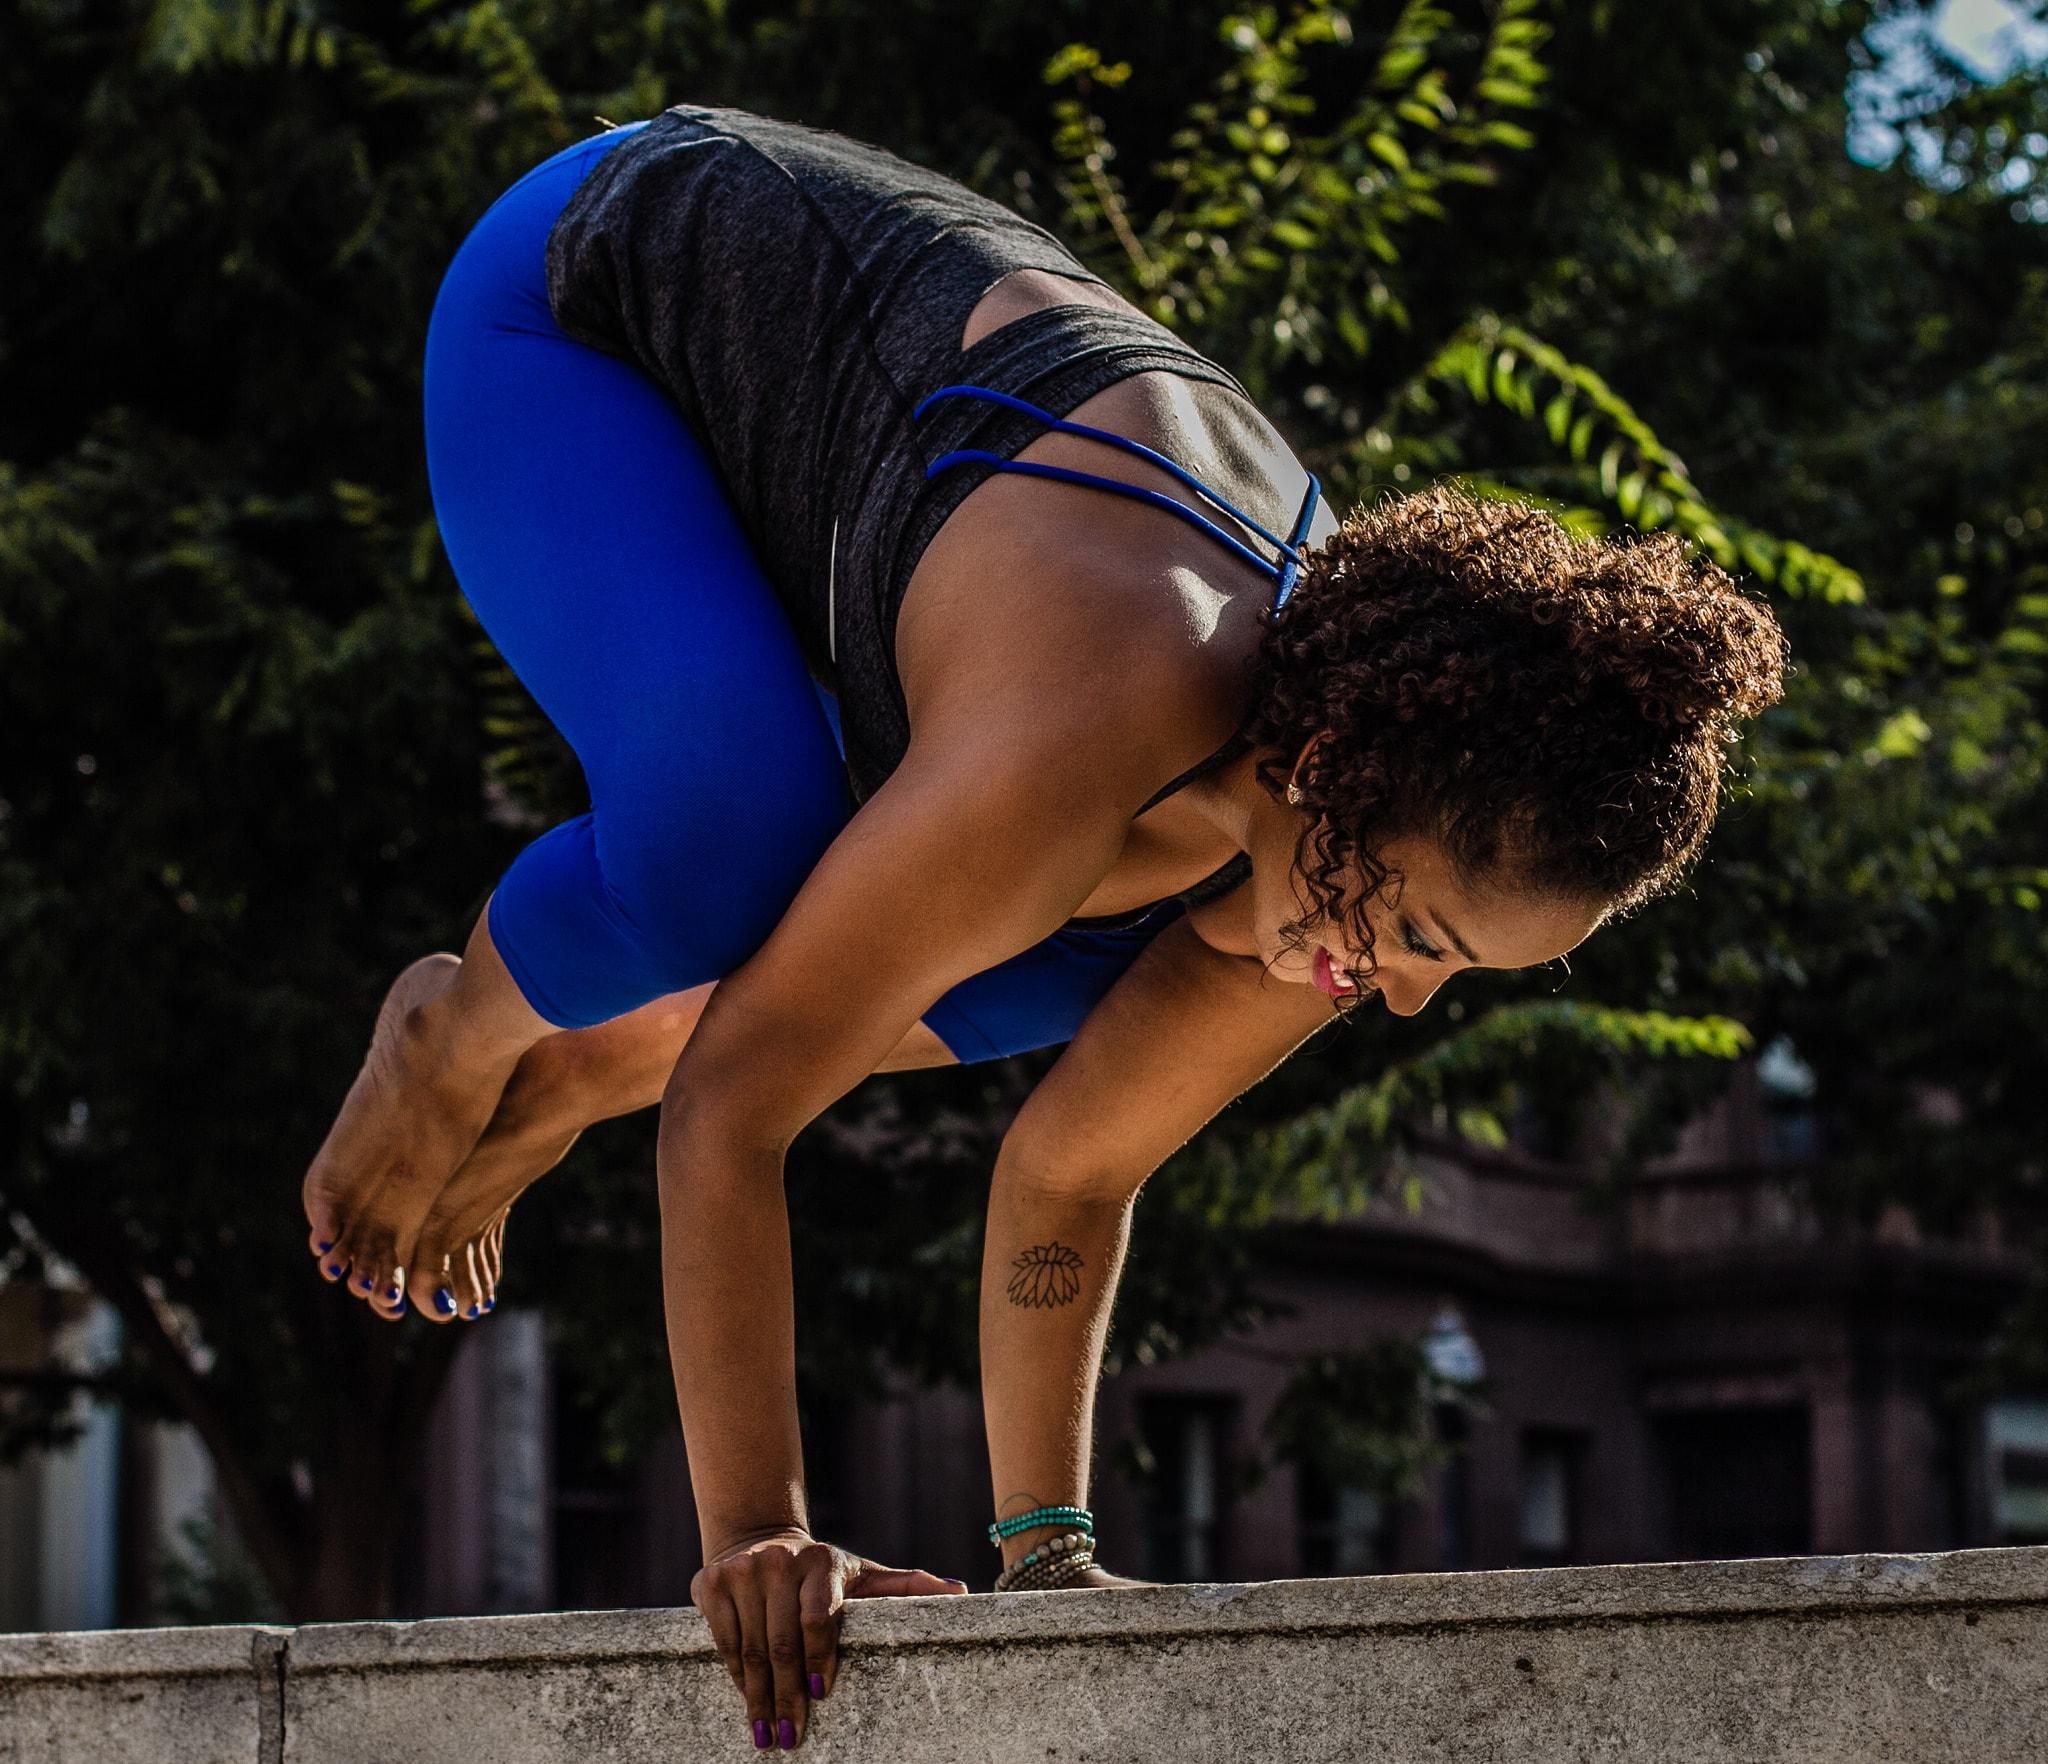 Yoga Balance | © Dave Rosenblum/Flickr